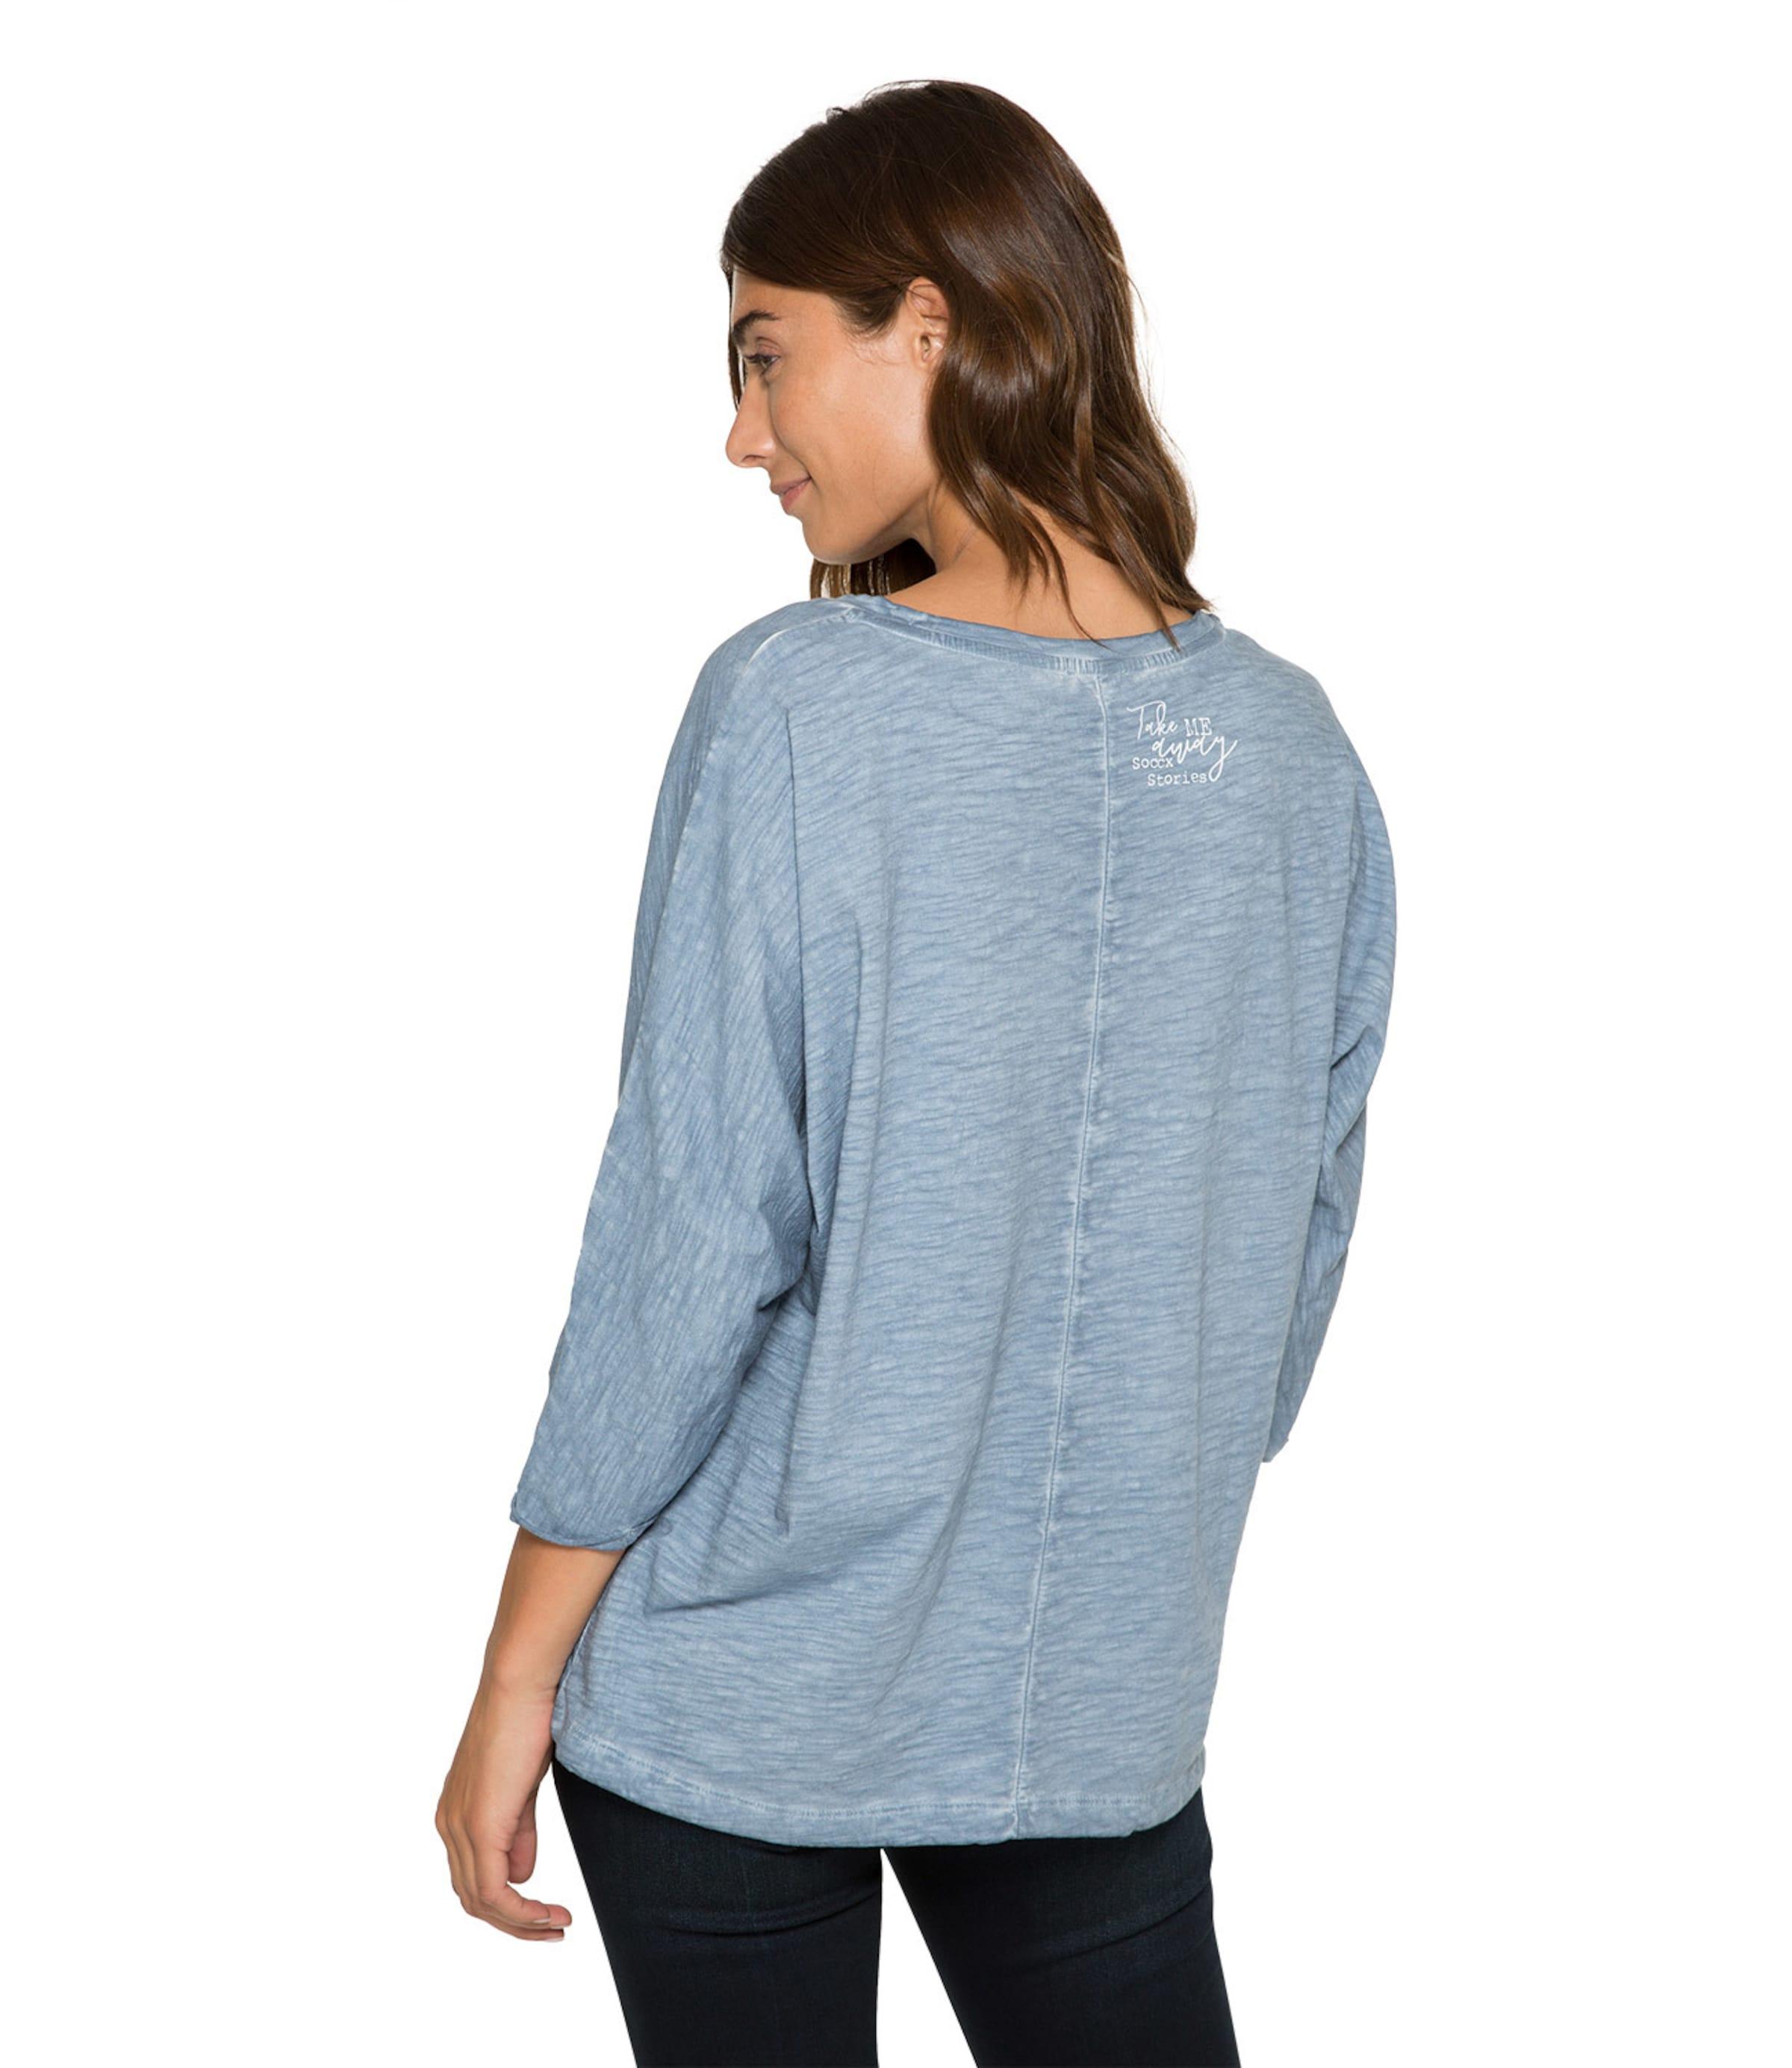 Shirt TaubenblauWeiß Shirt In In Soccx Soccx 54qc3jARL